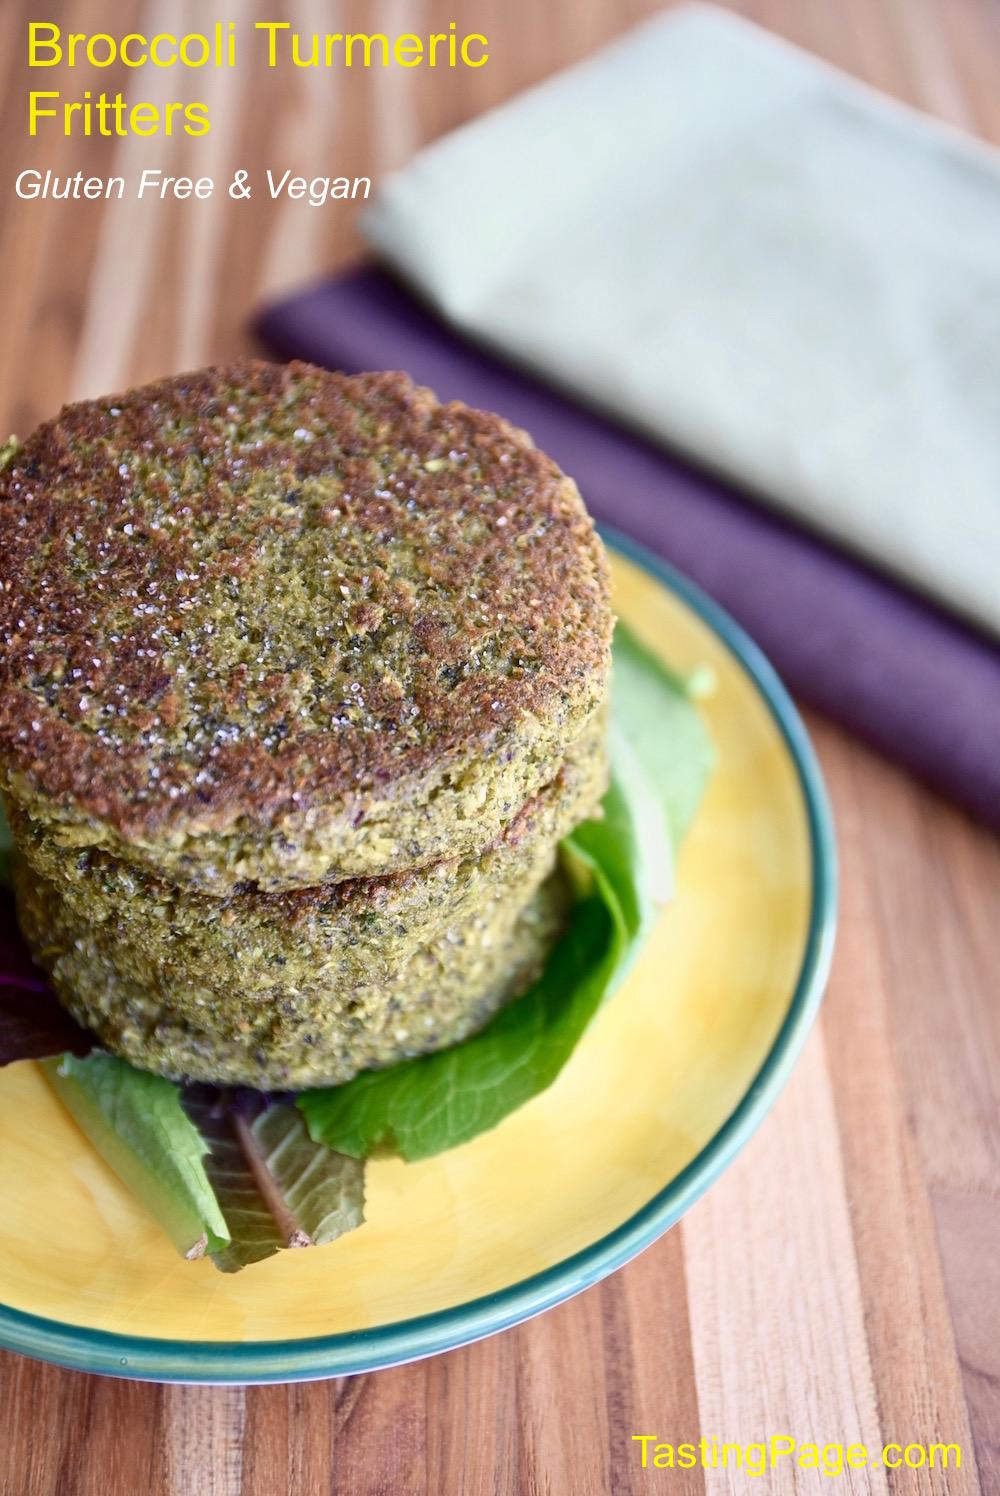 Broccoli Turmeric Fritter - gluten free and vegan | TastingPage.com